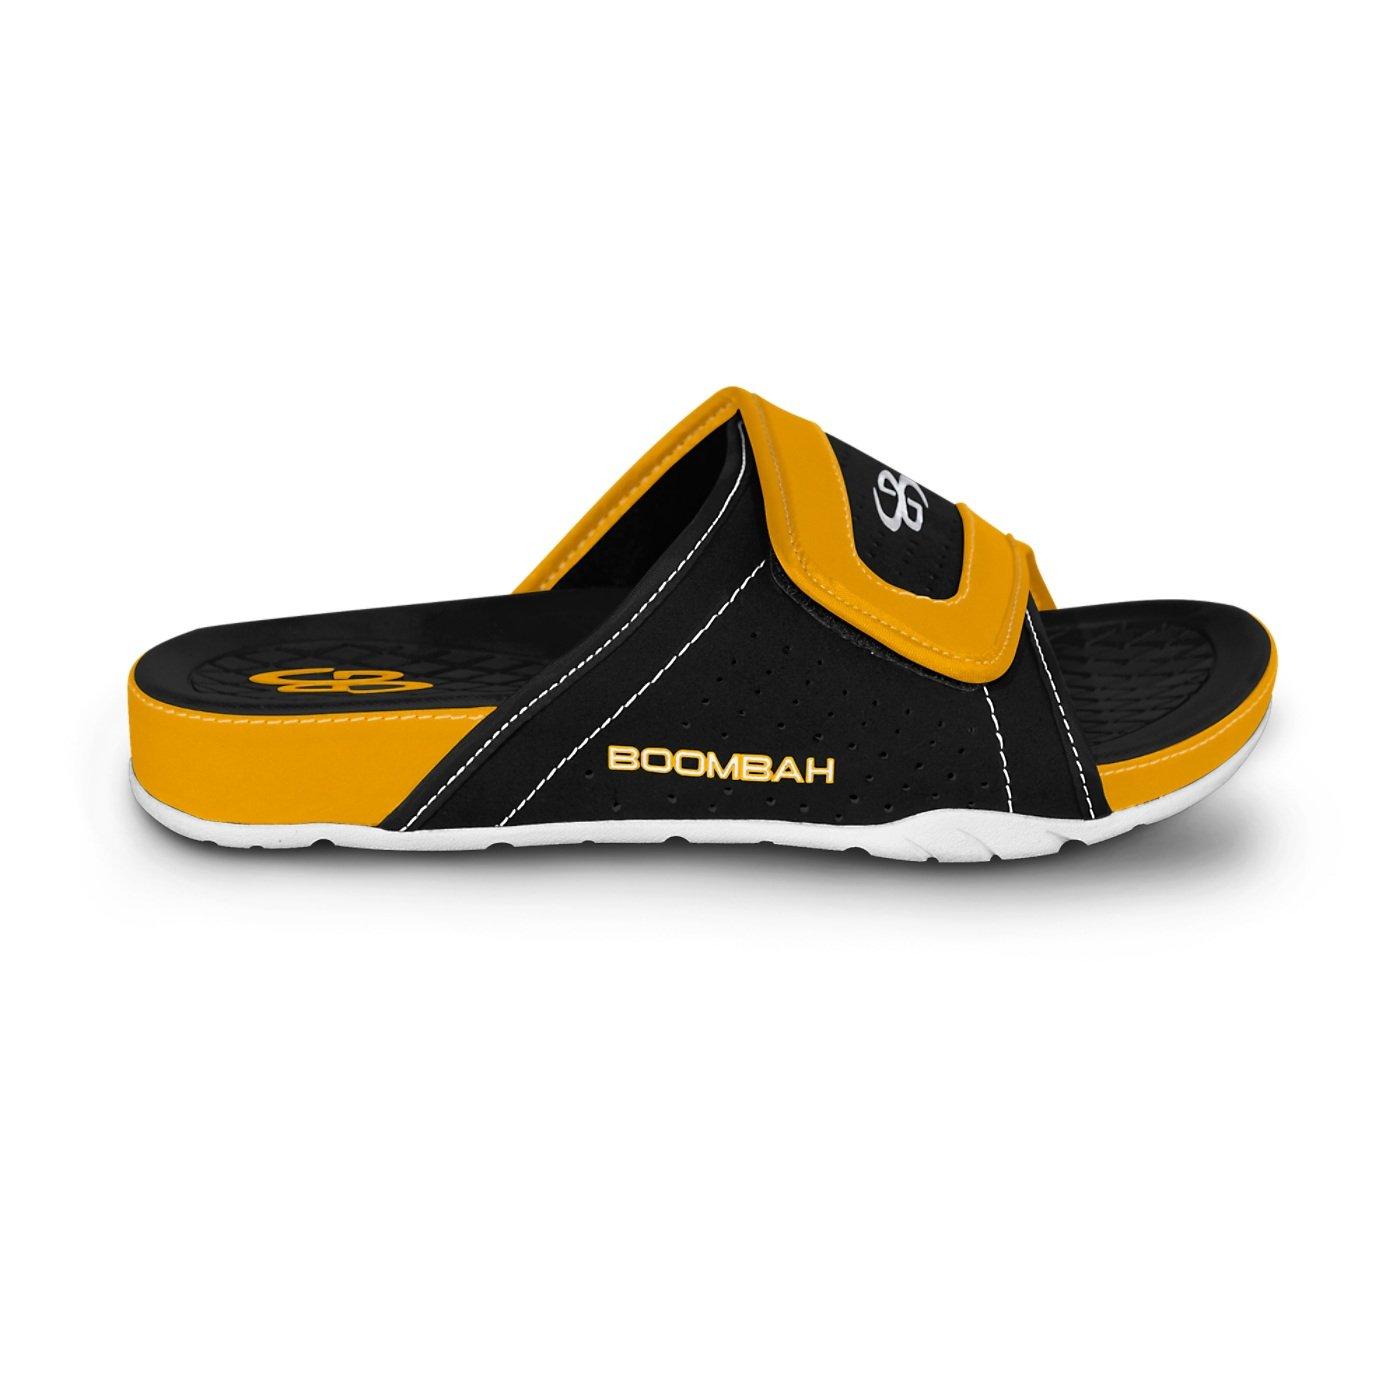 Boombah Men's Tyrant Slide Sandals - 32 Color Options - Multiple Sizes B077NL6T35 7 Black/Gold